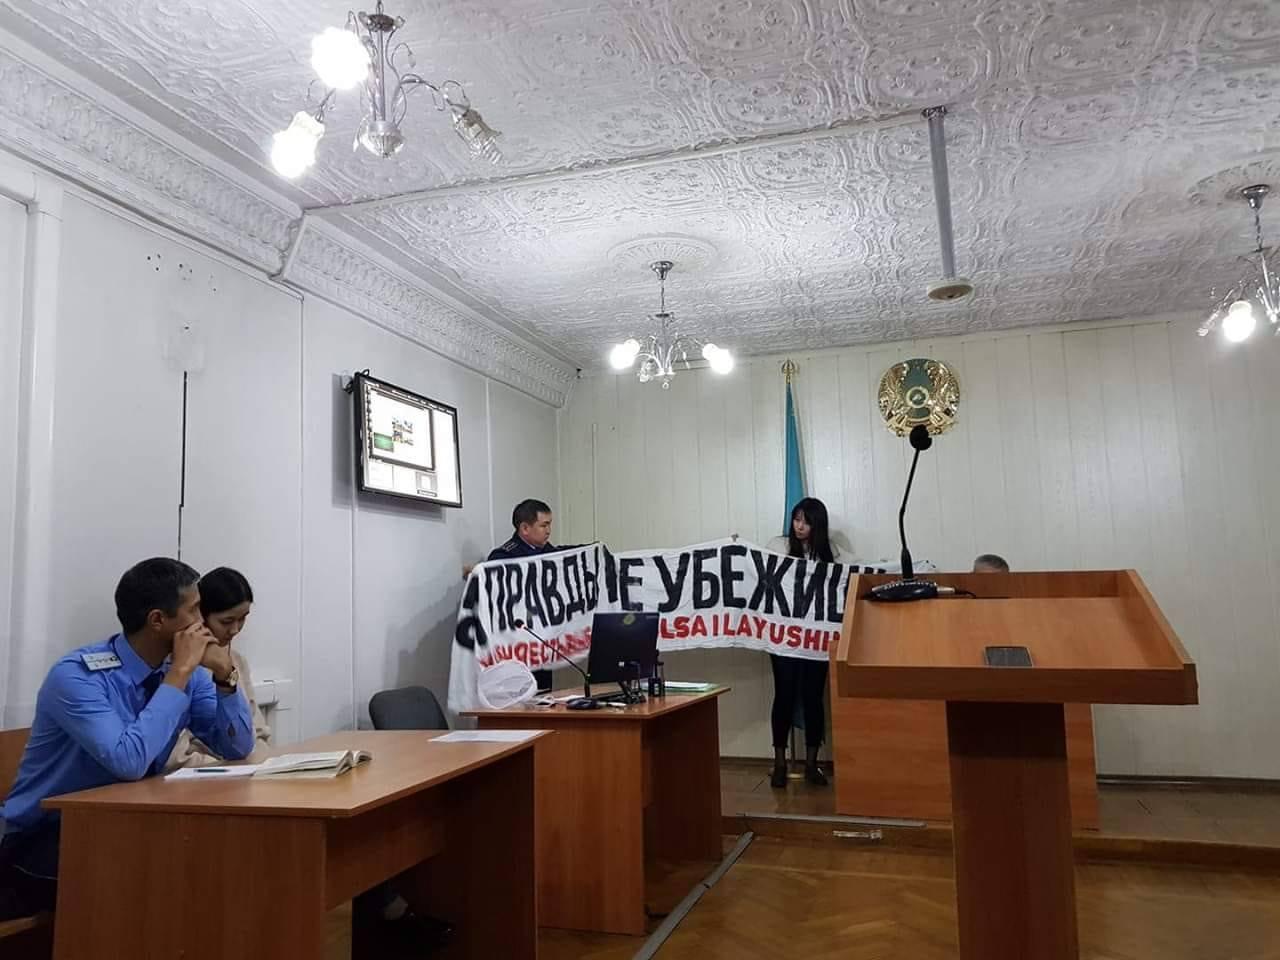 Алматинцев арестовали за баннер о выборах